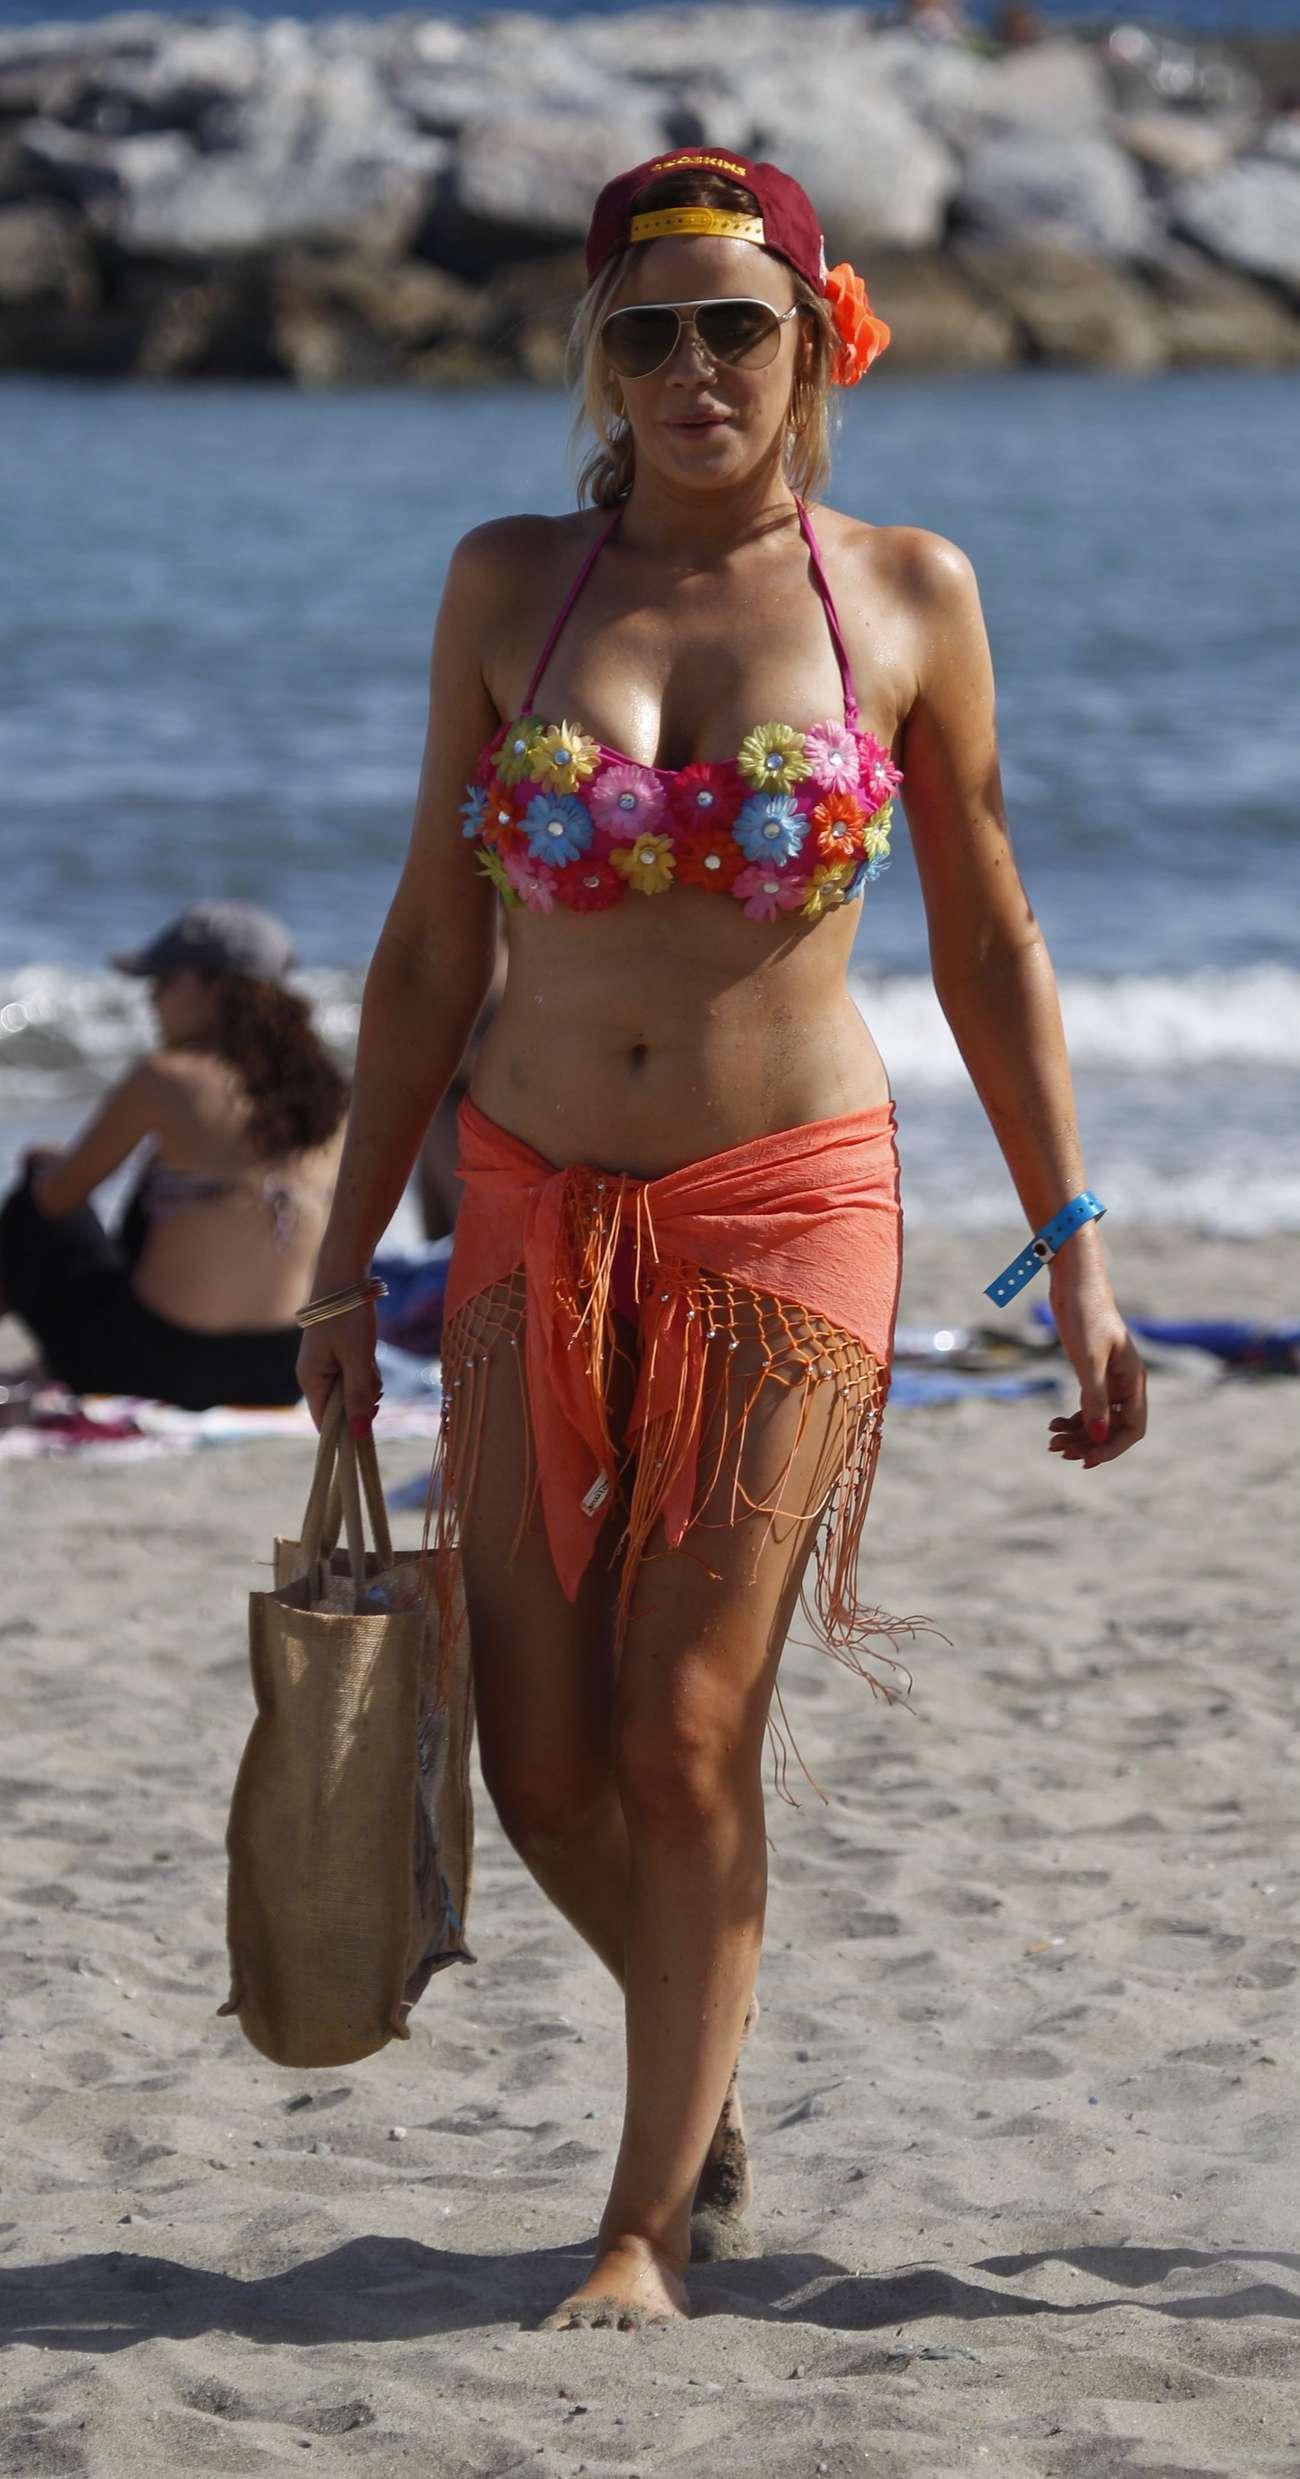 Bikini Maria Fowler naked (79 photo), Topless, Cleavage, Feet, bra 2020